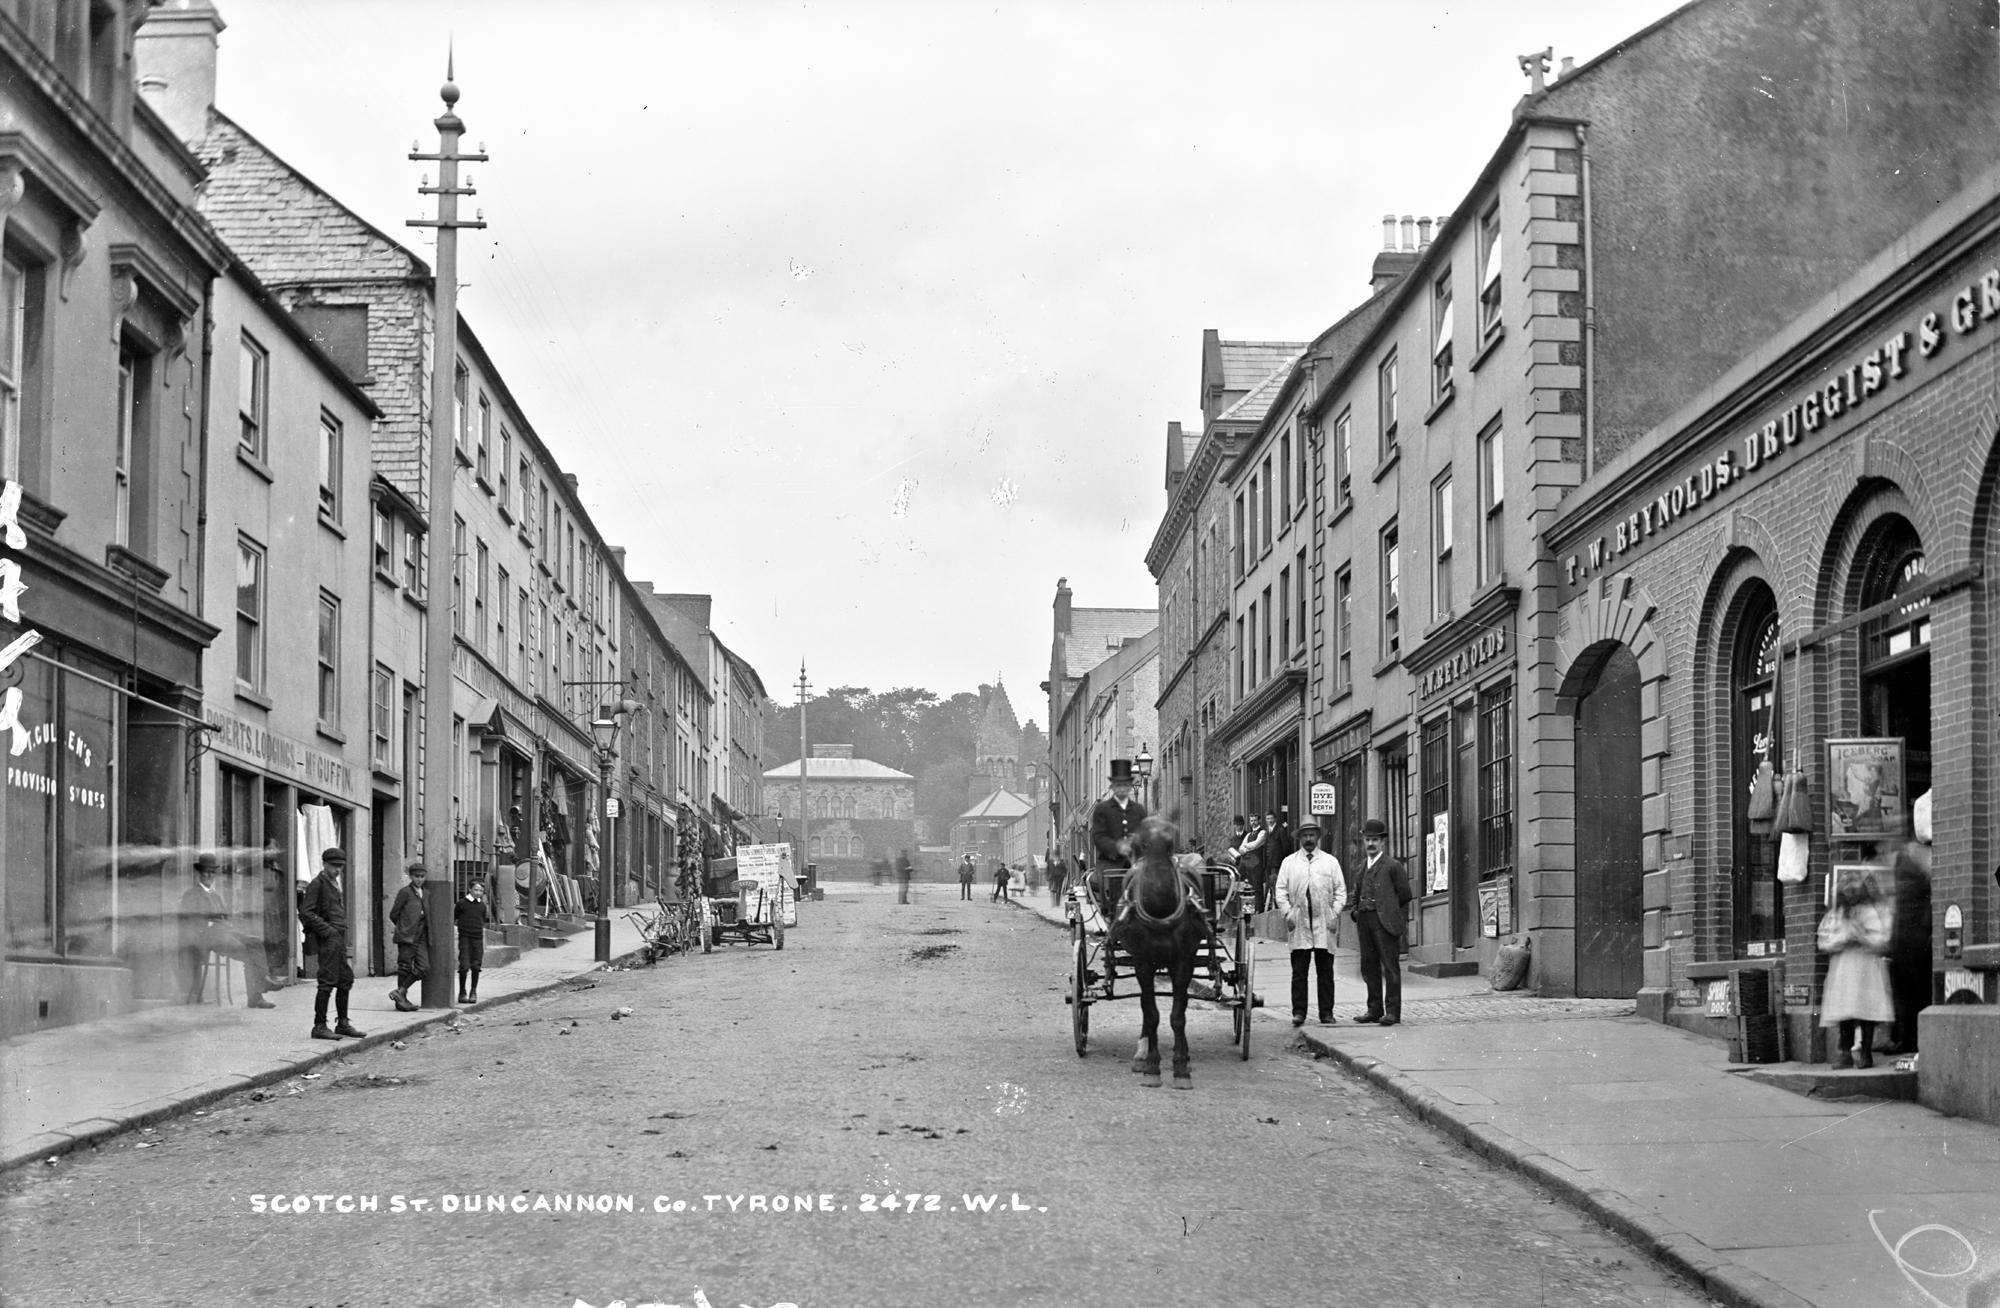 Scotch Street, Dungannon, Co. Tyrone